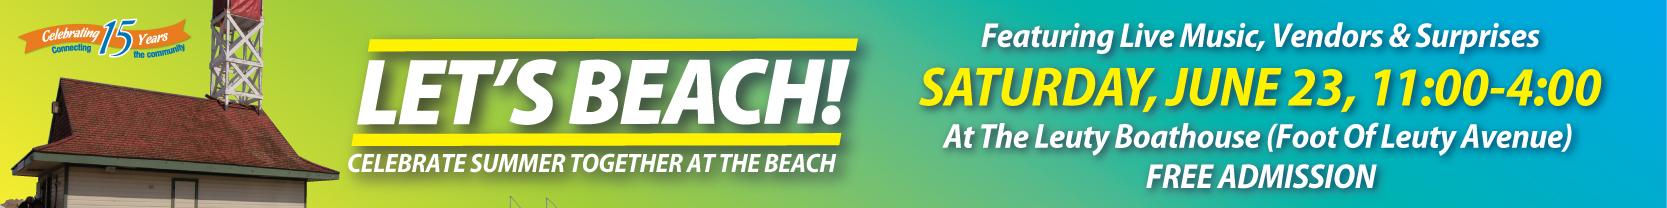 Let's Beach 2018